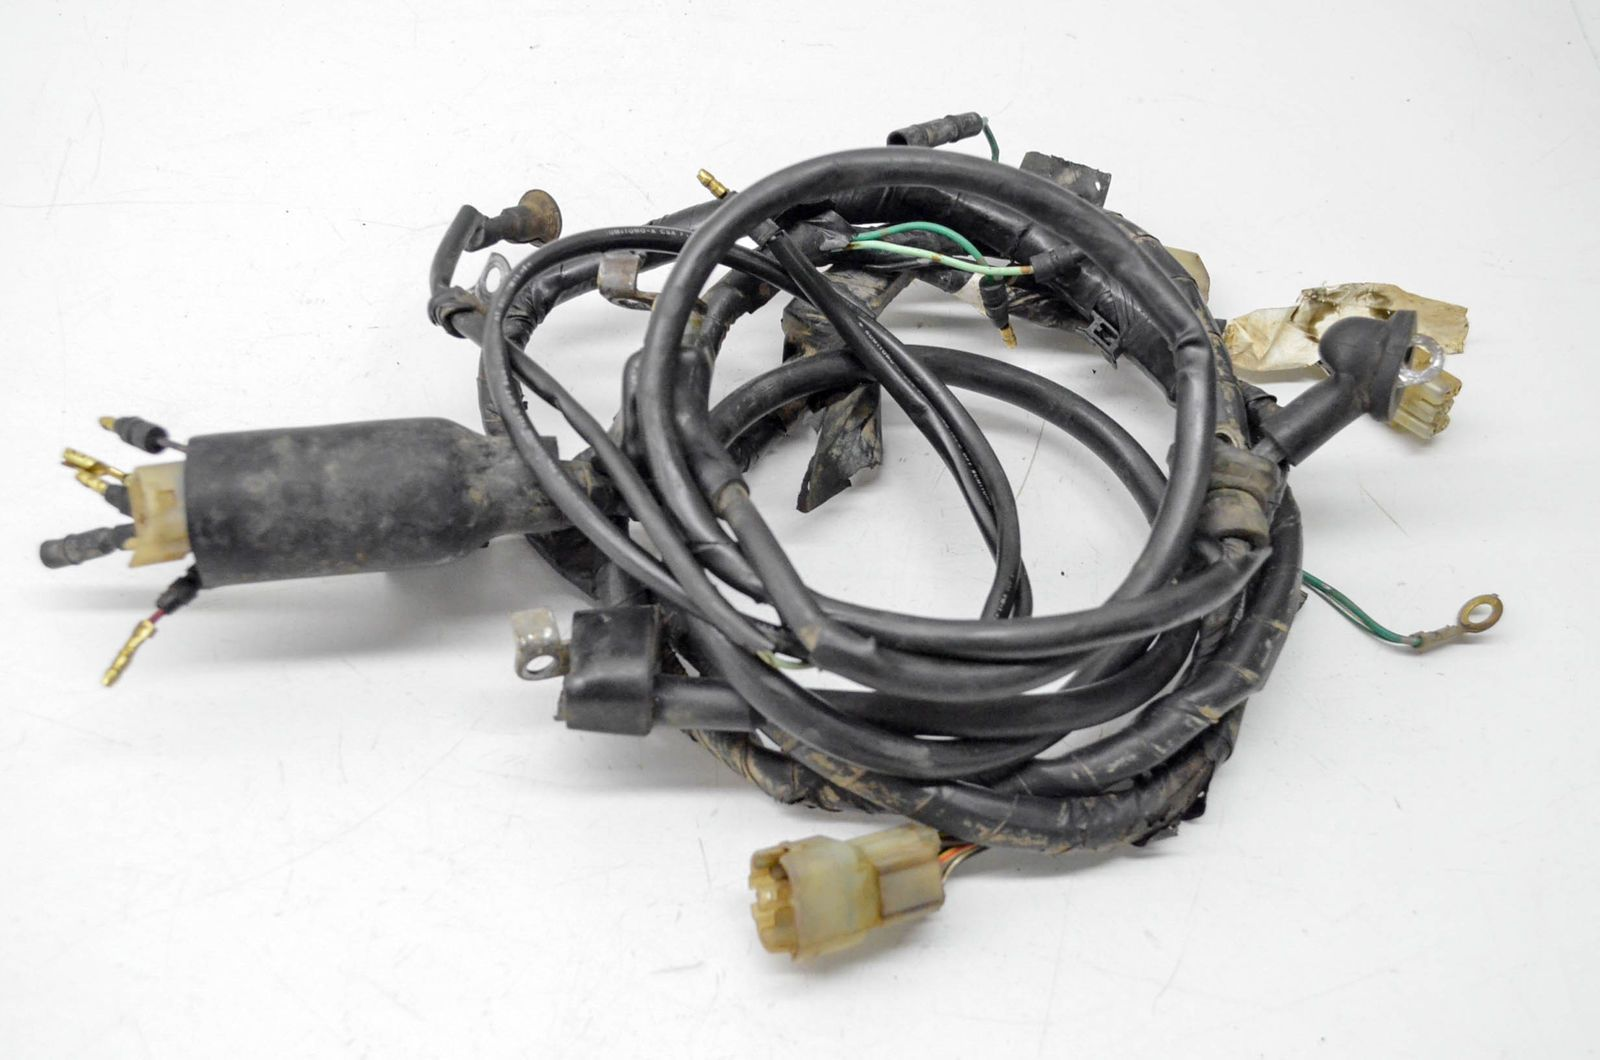 99 04 honda trx 400ex 400 ex wiring harness cdi box rectifier electrical price 89 99 [ 1600 x 1060 Pixel ]